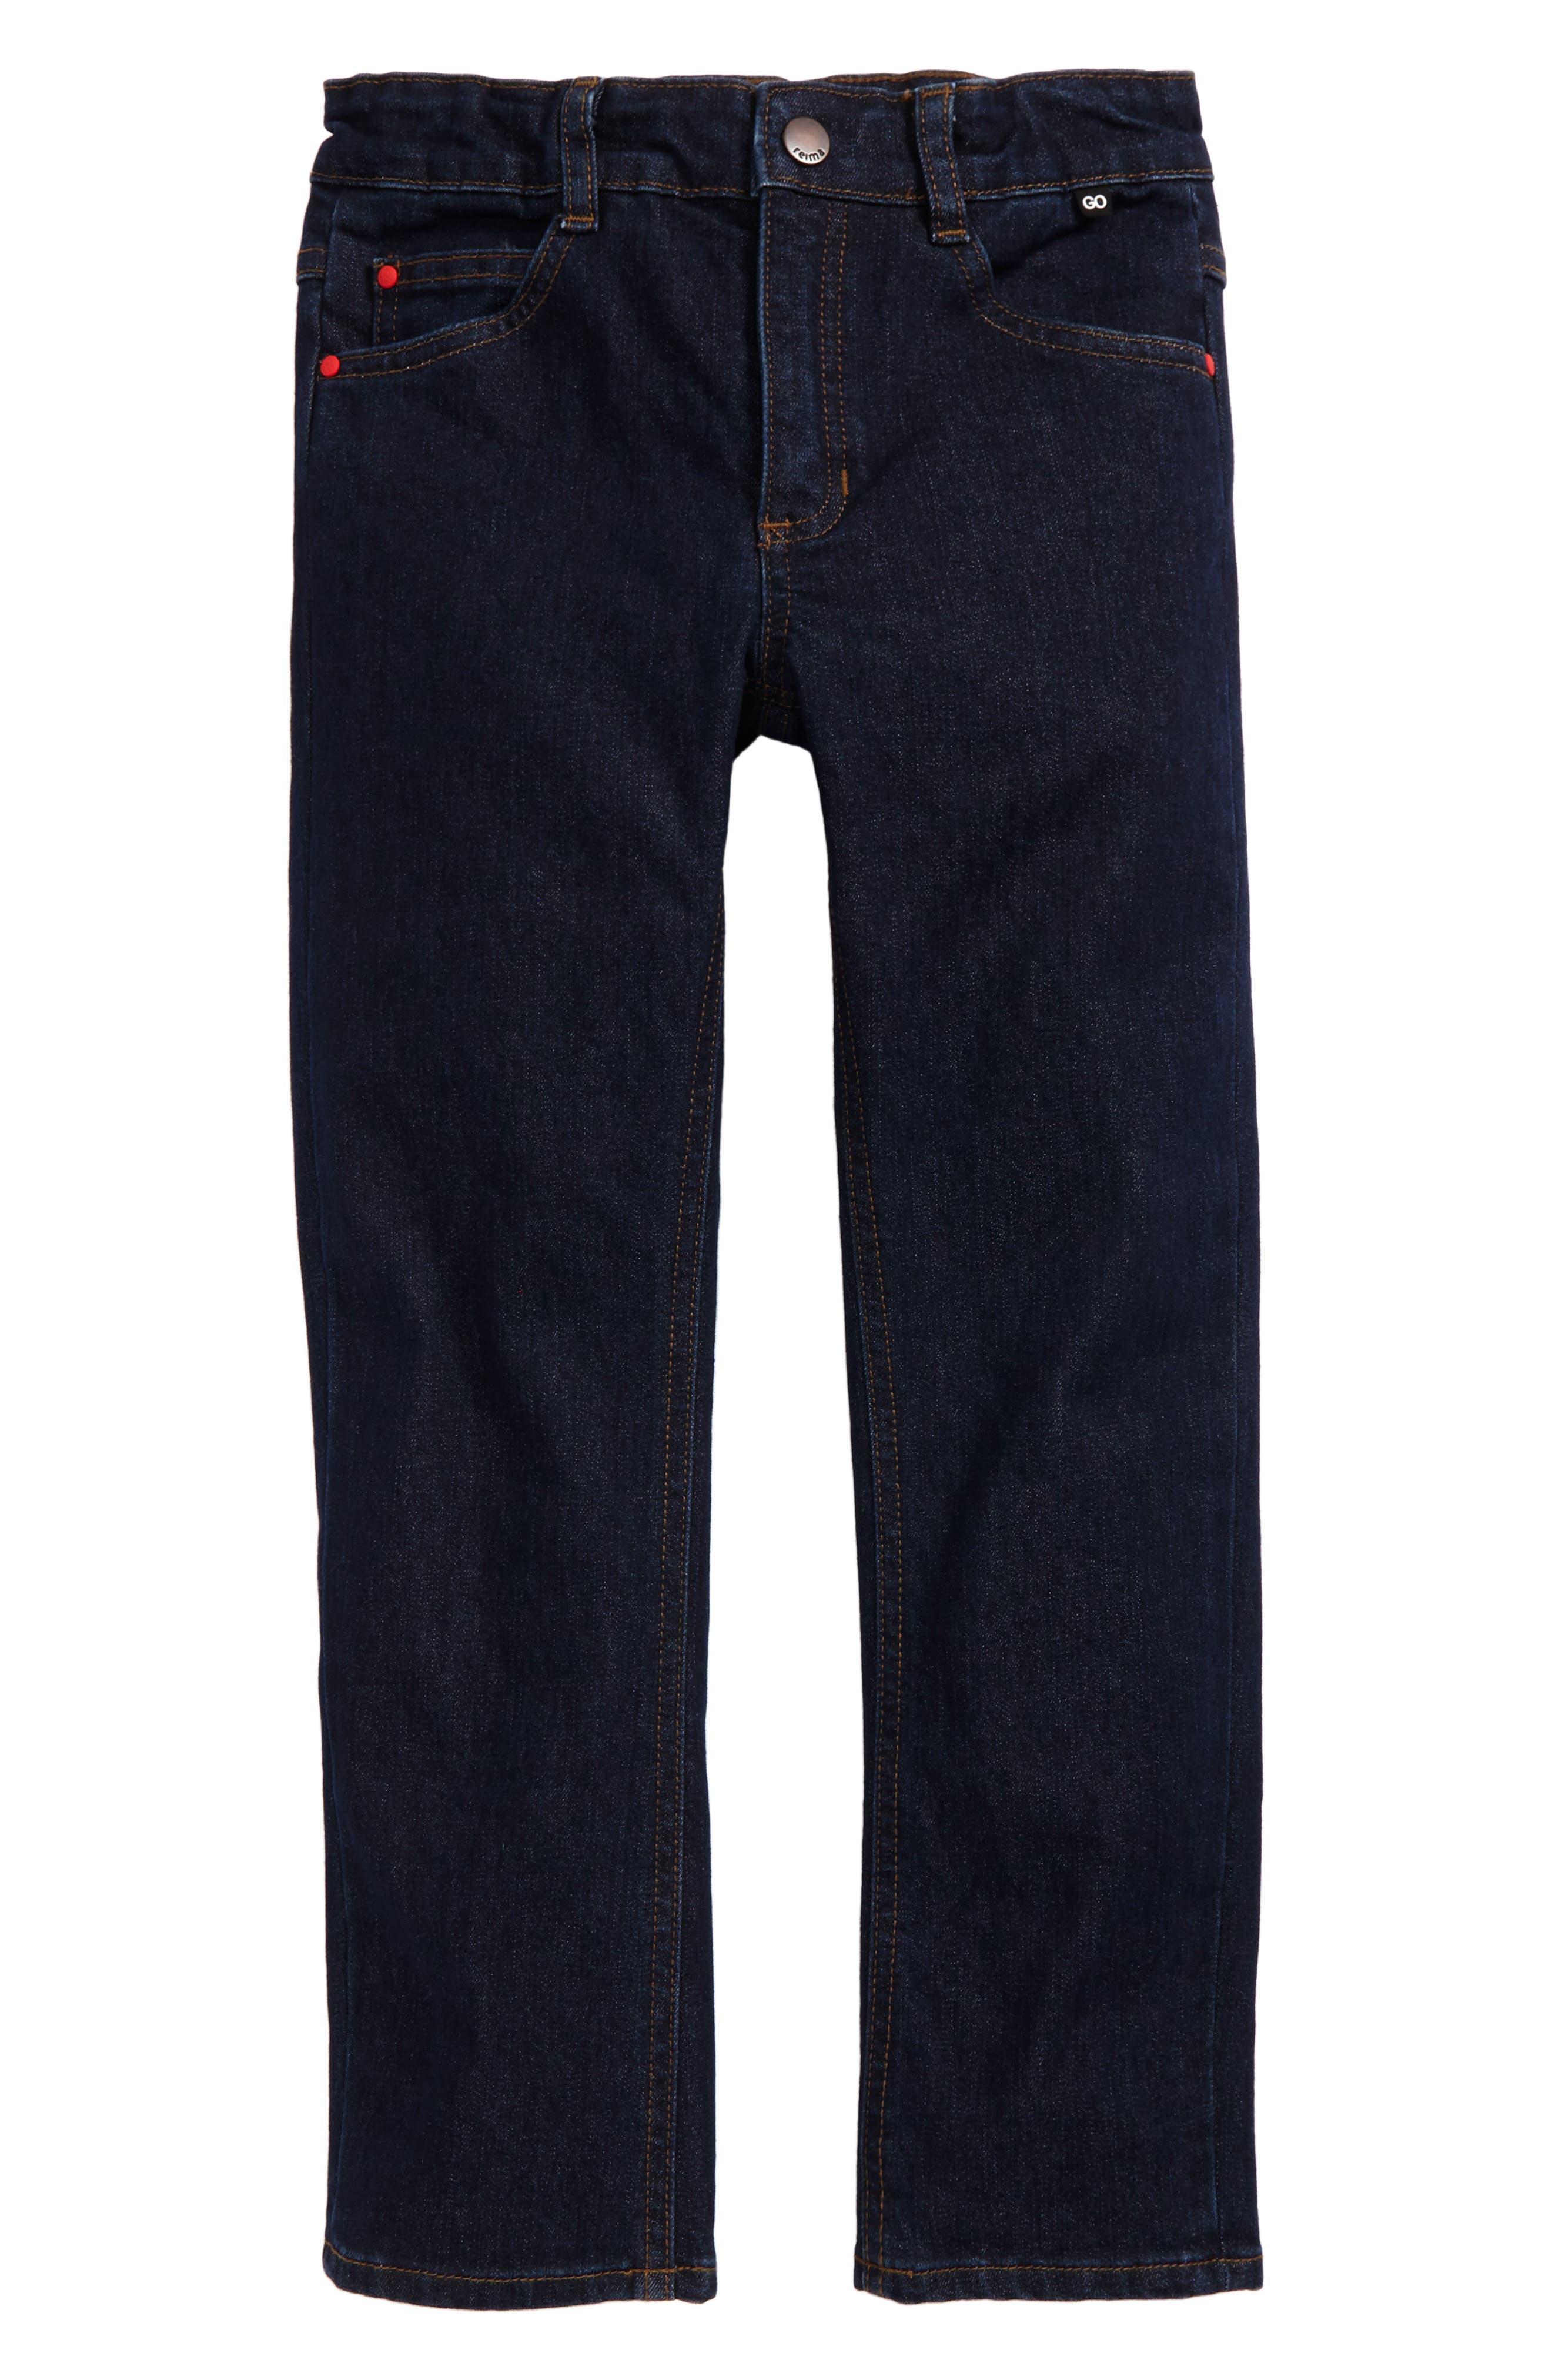 Main Image - Reima Trick Straight Leg Jeans (Big Boys)